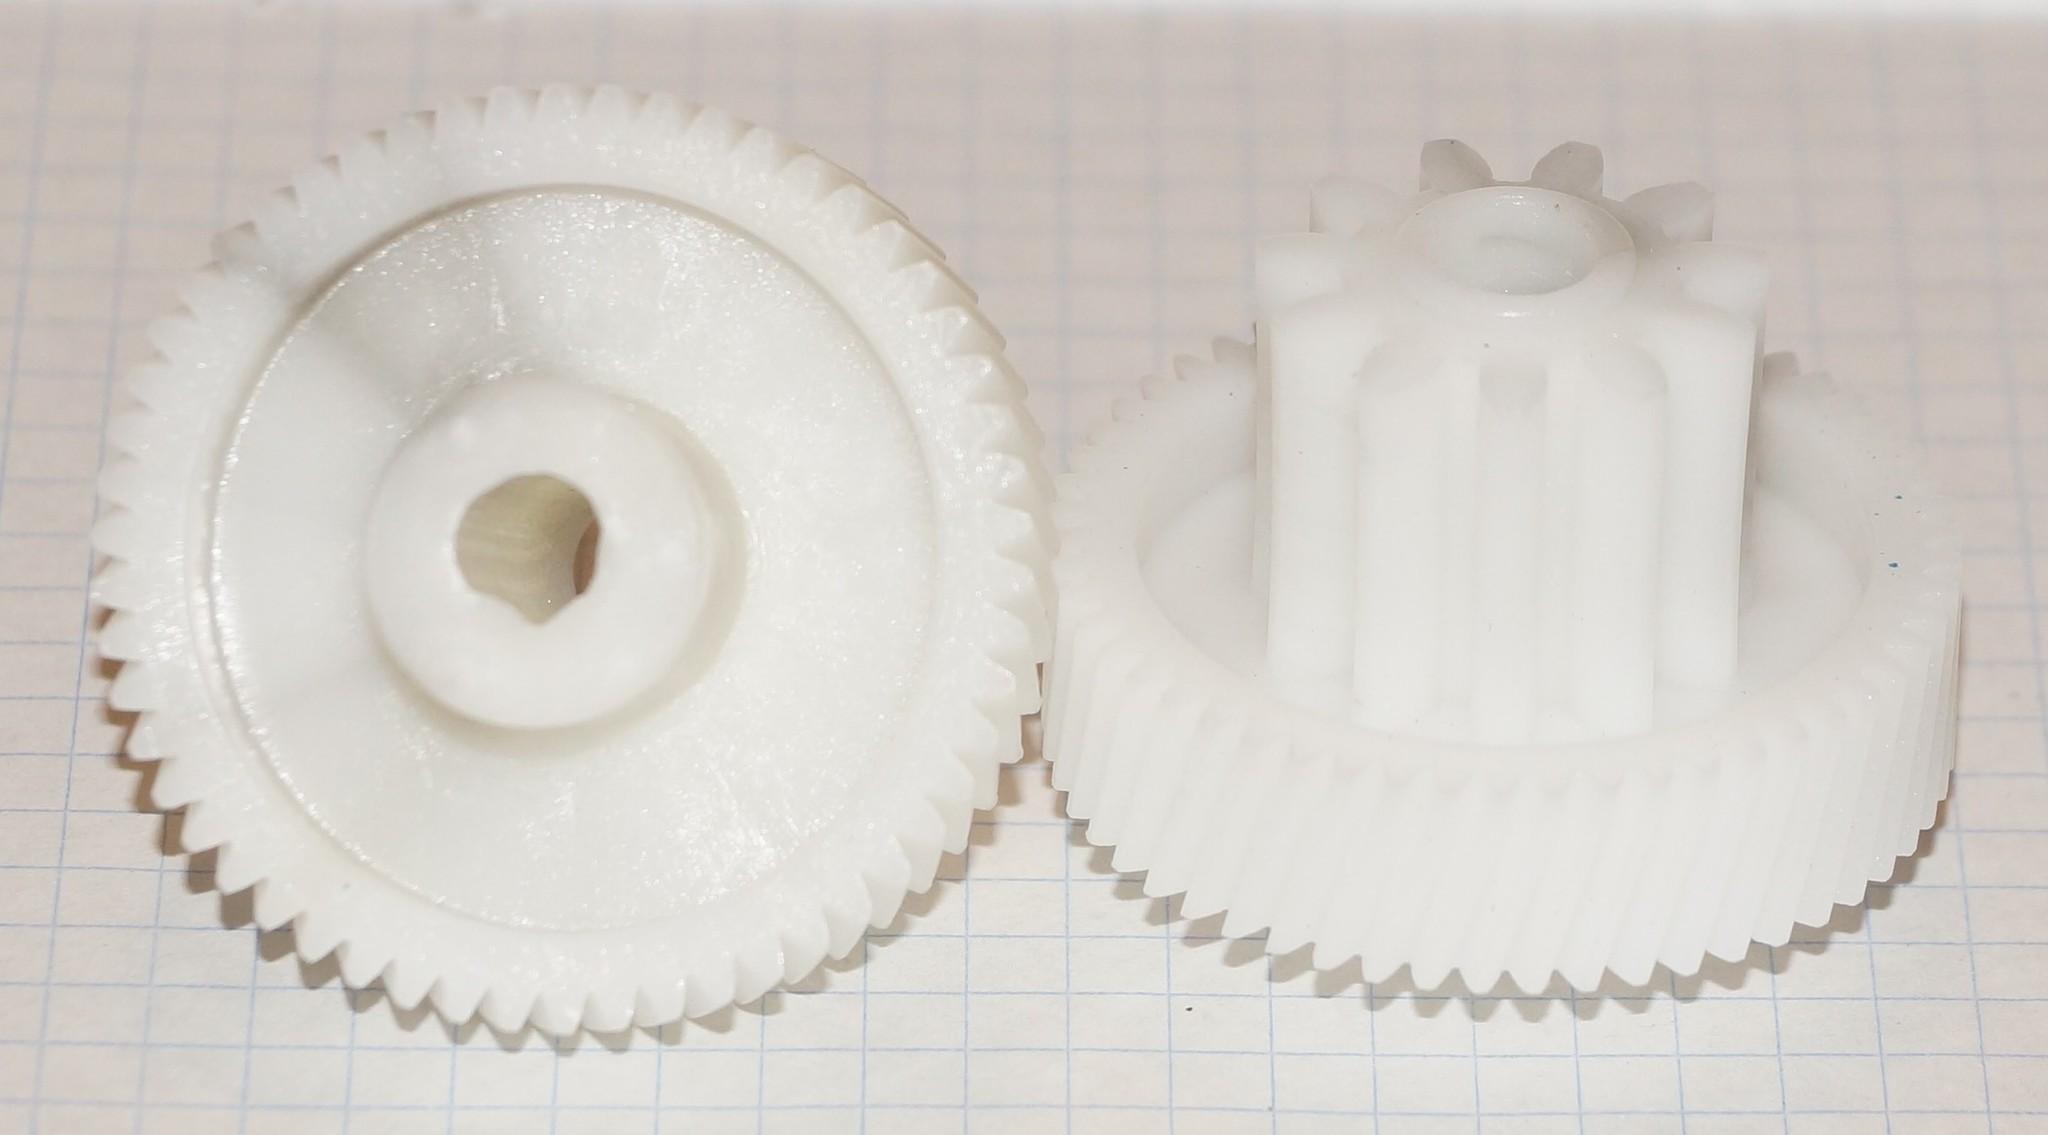 Шестерня мясорубки Saturn, Дельта 11 зуб.